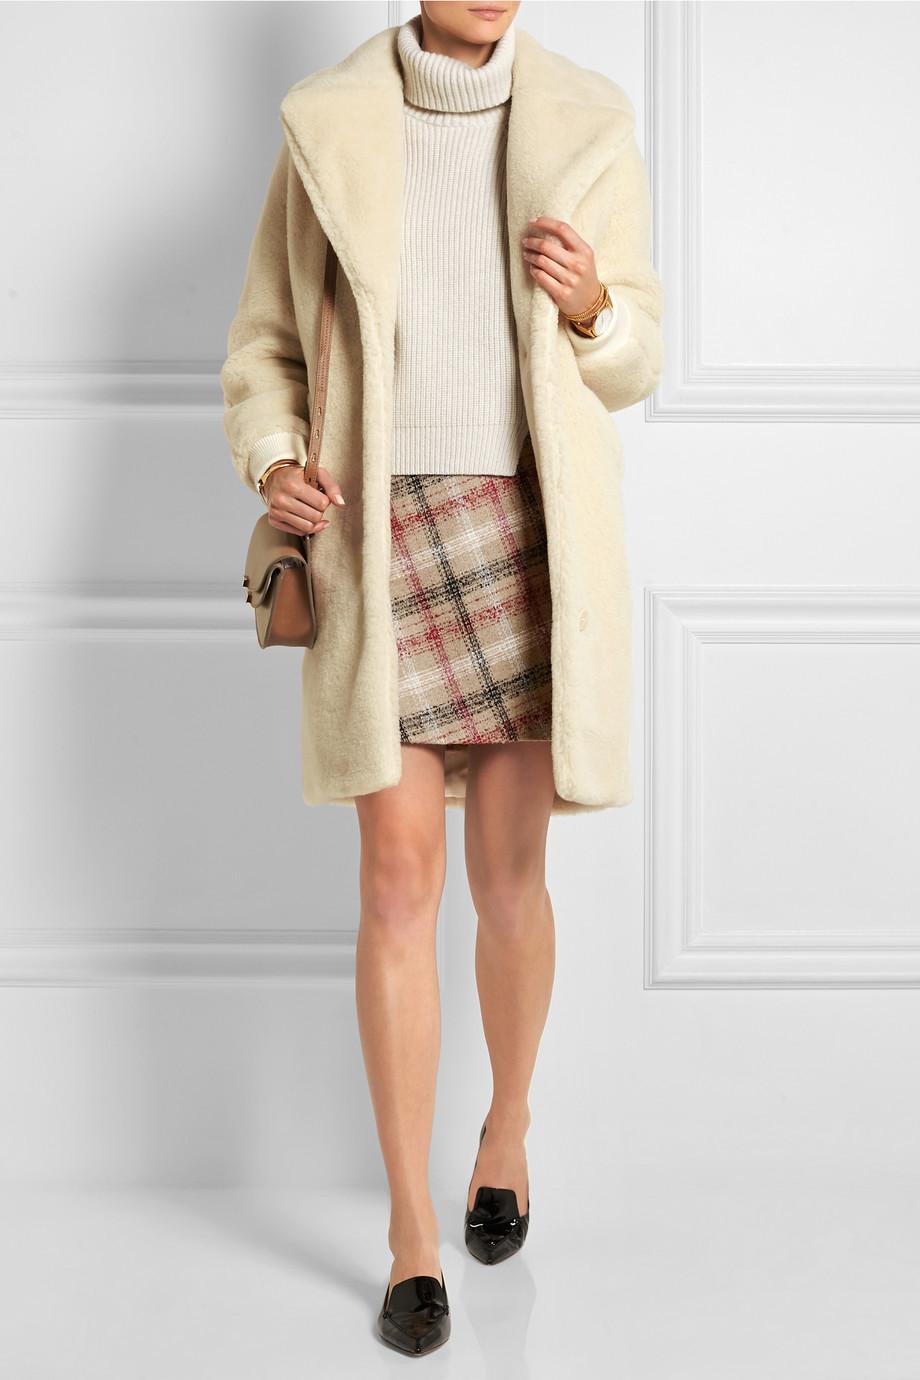 a turtleneck and mini skirt 3